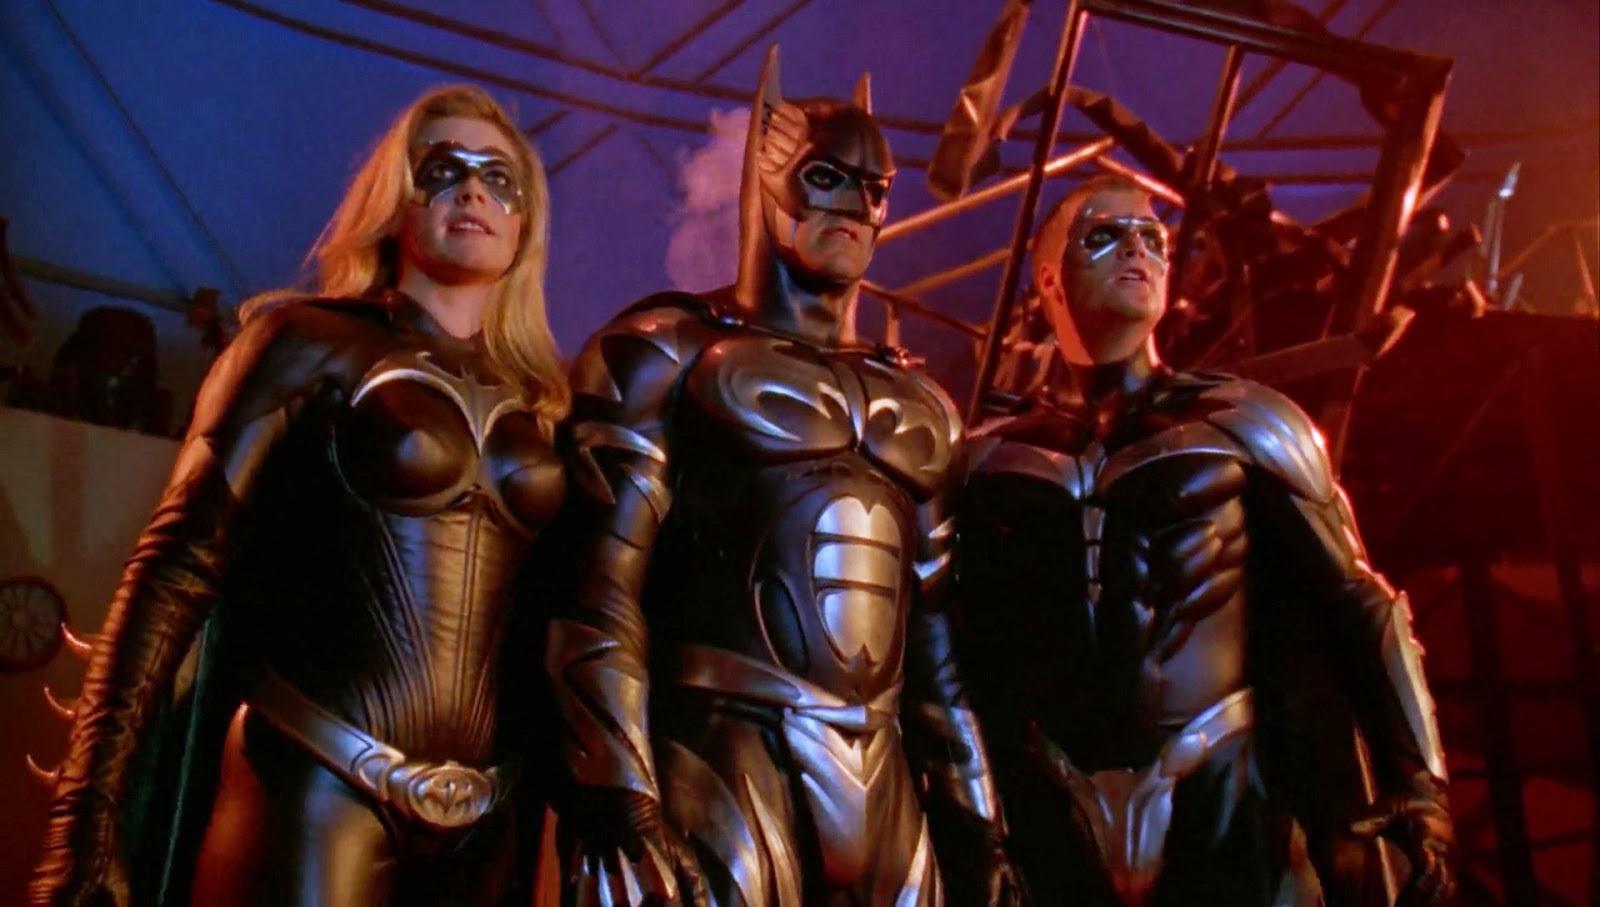 Source: Warner Bros/Reproduction